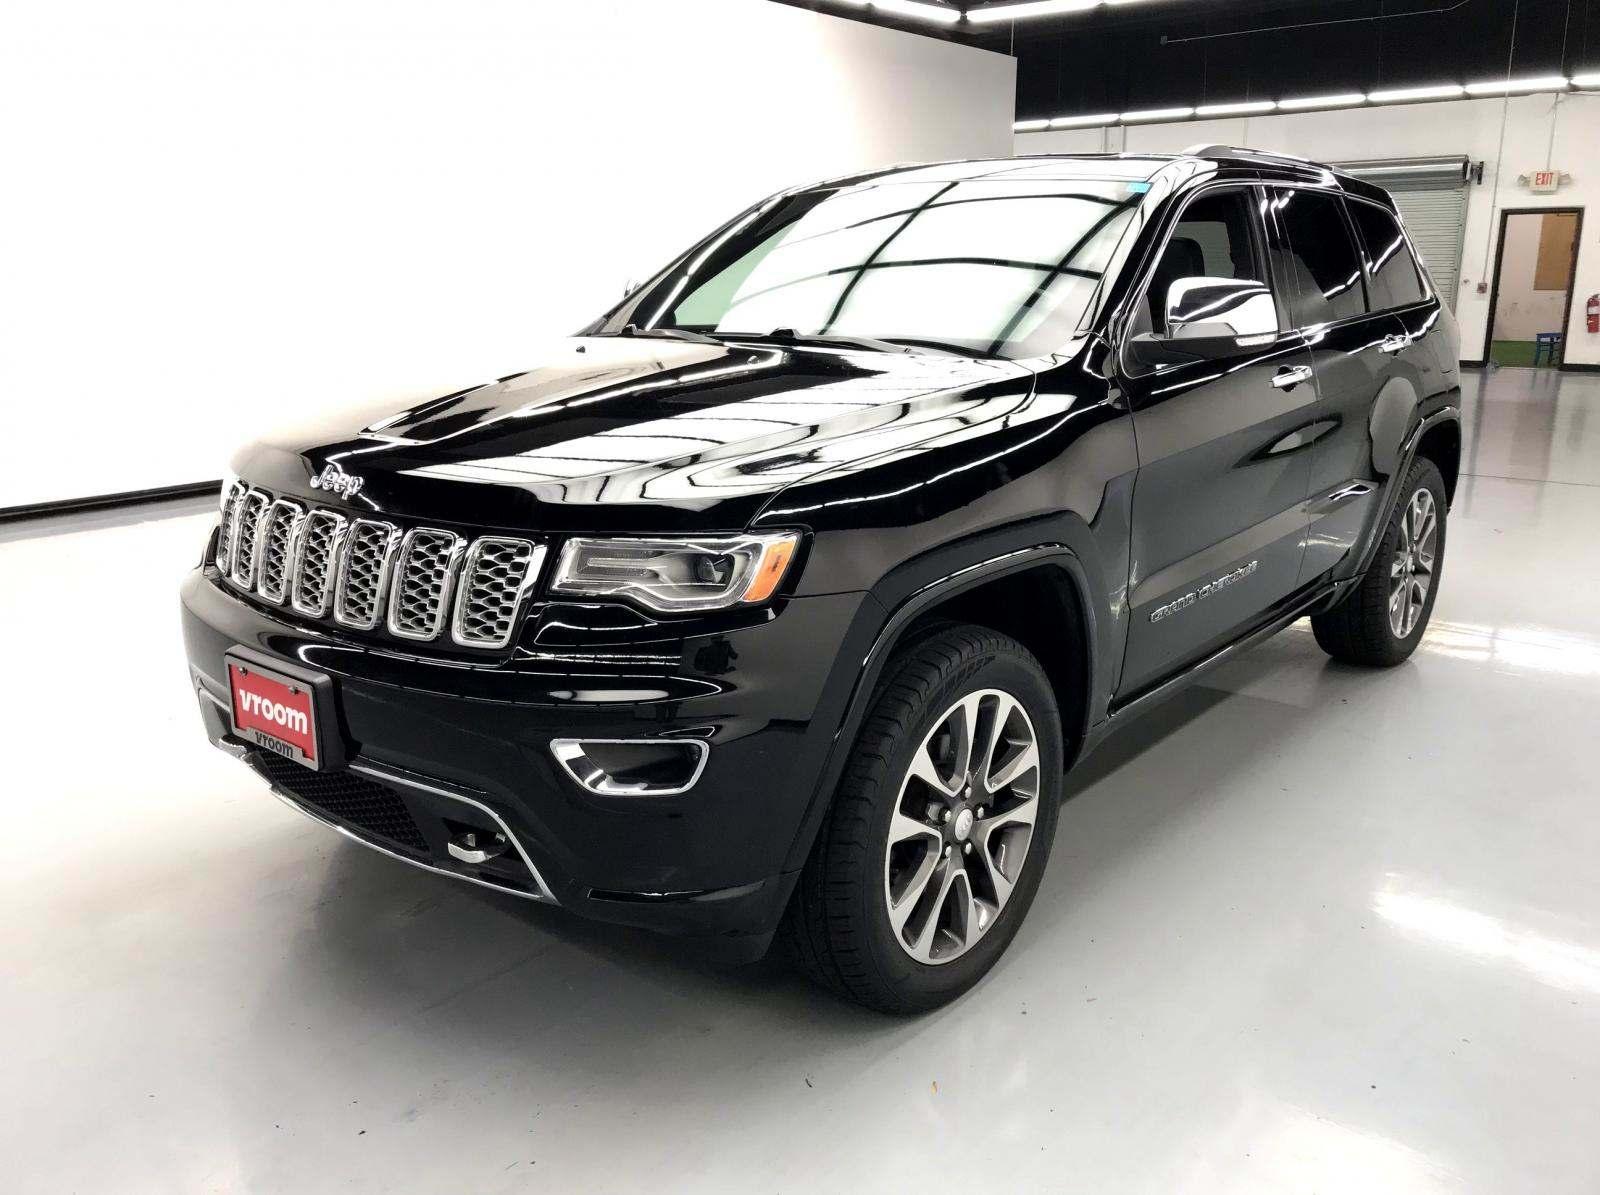 used Jeep Grand Cherokee 2017 vin: 1C4RJFCG6HC749833